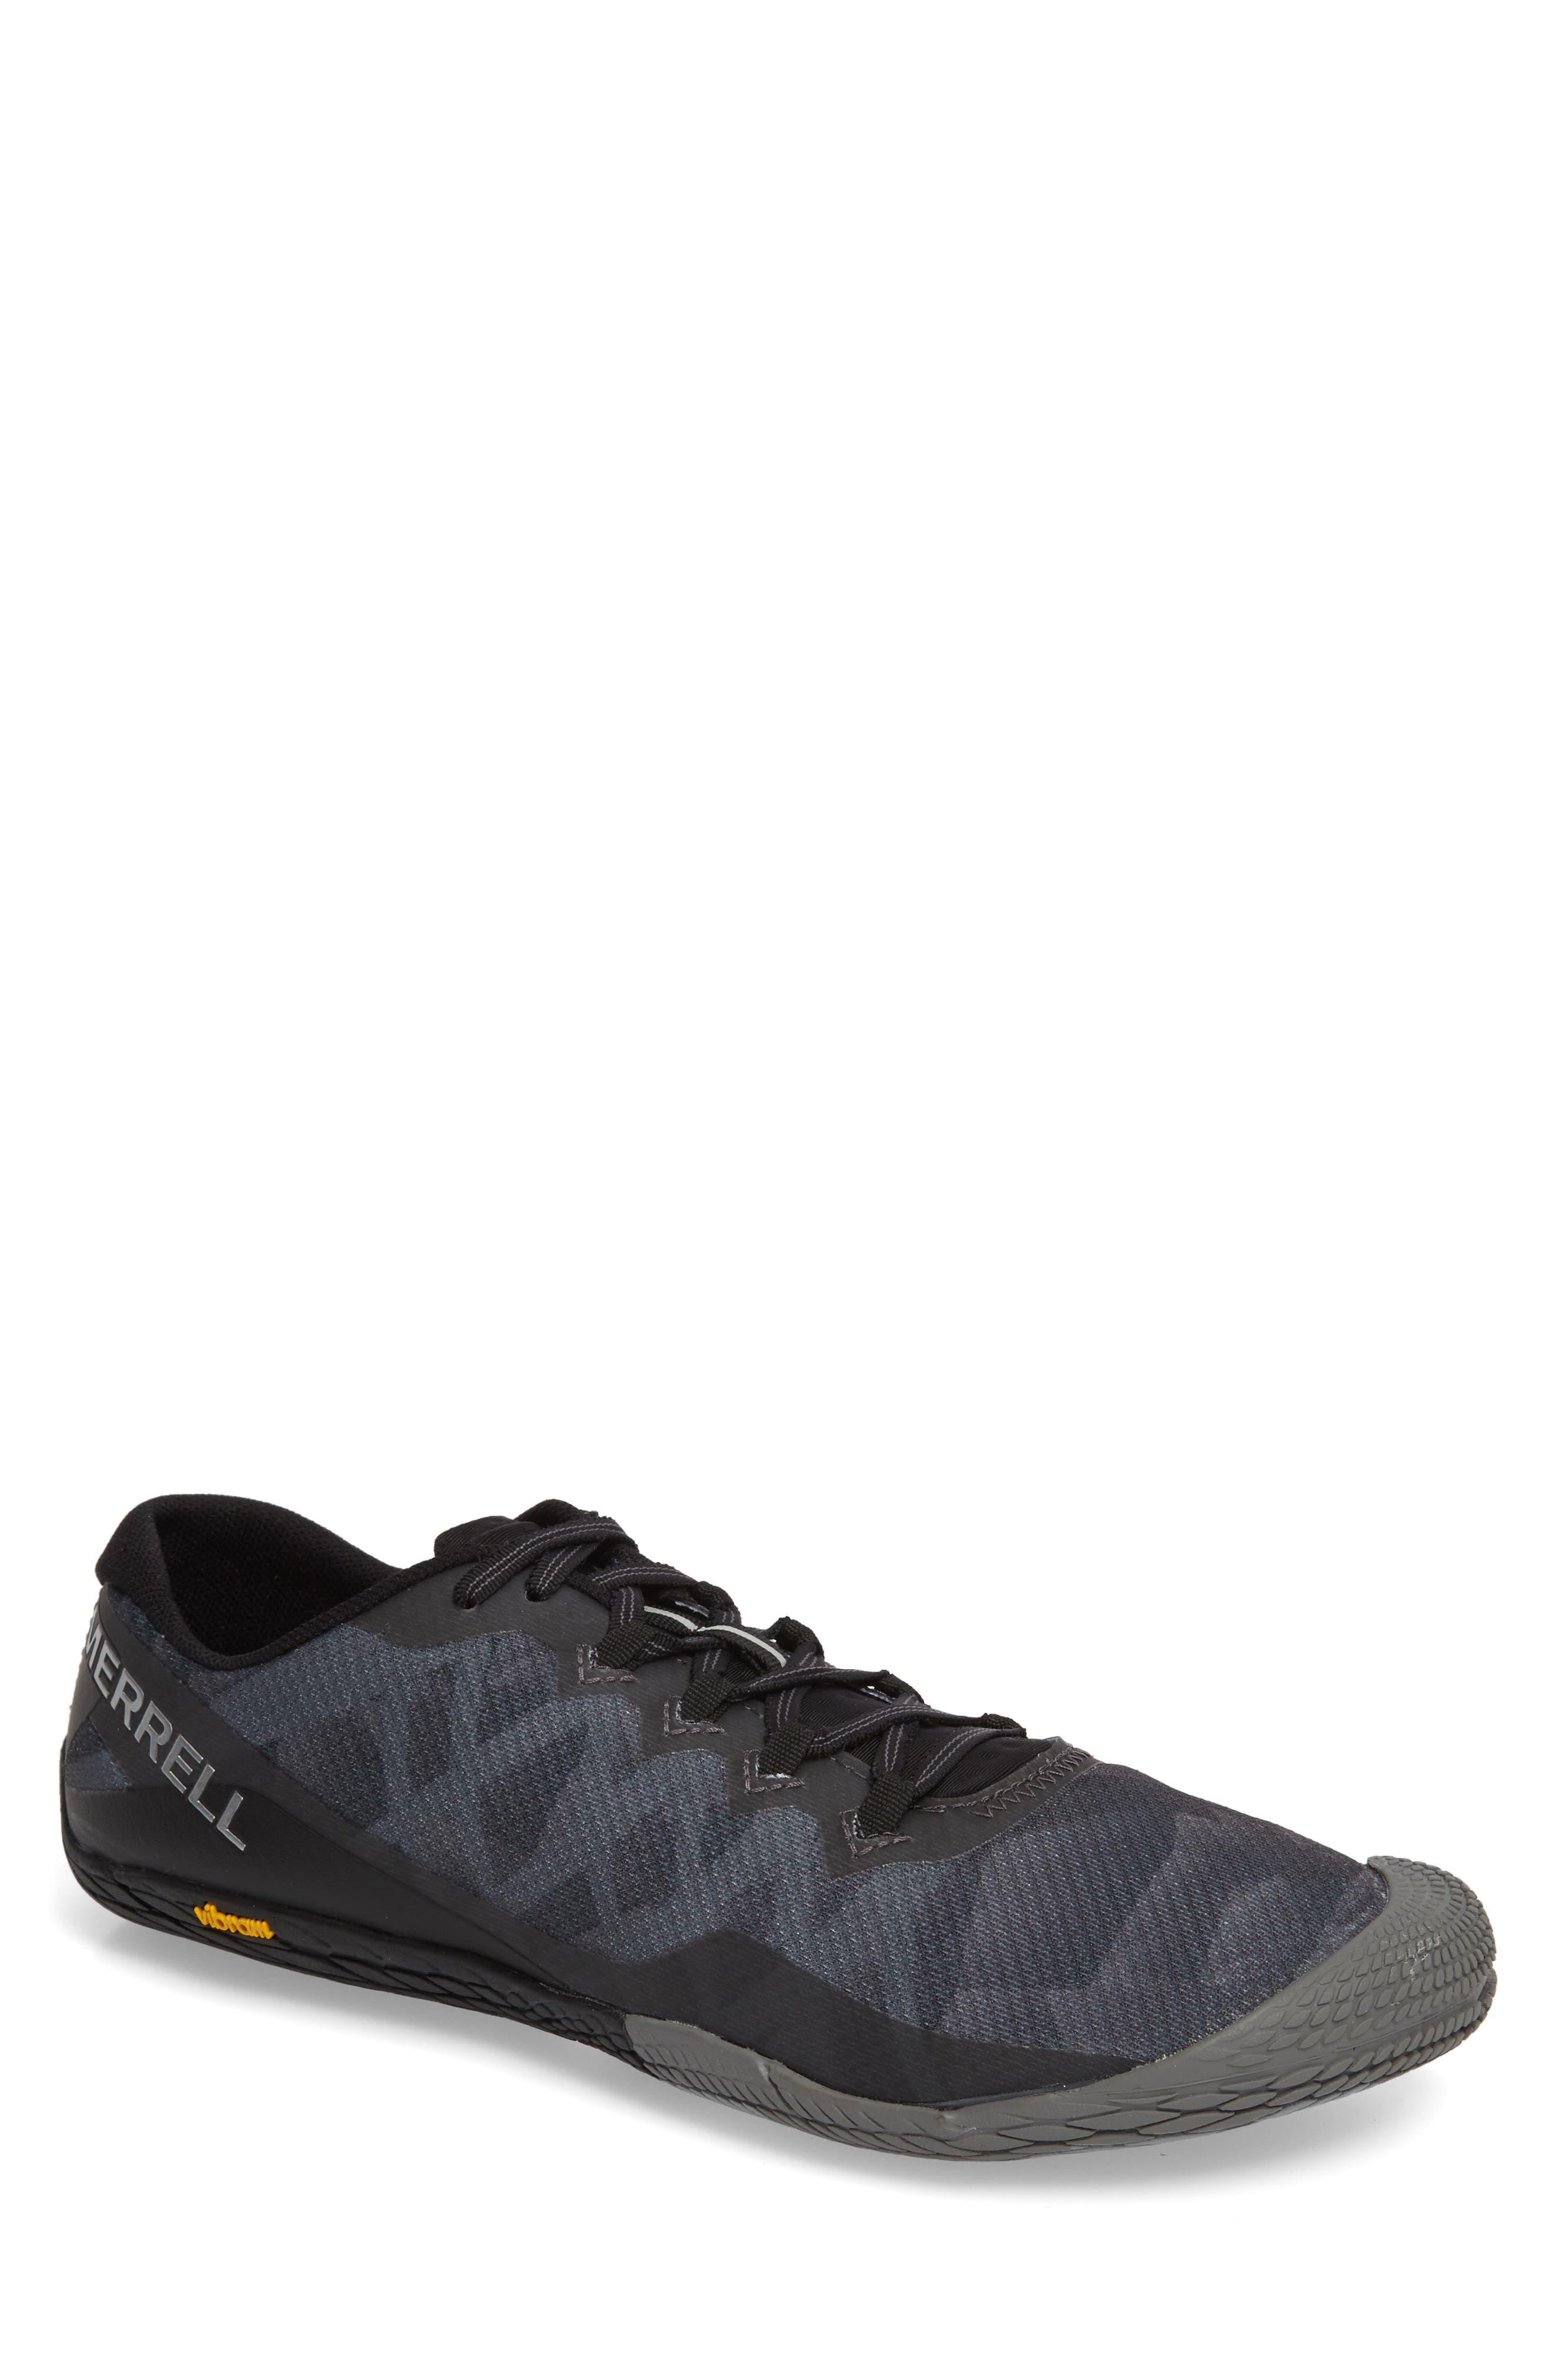 Vapor Glove 3 Trail Running Shoe,                             Main thumbnail 1, color,                             BLACK/ SILVER